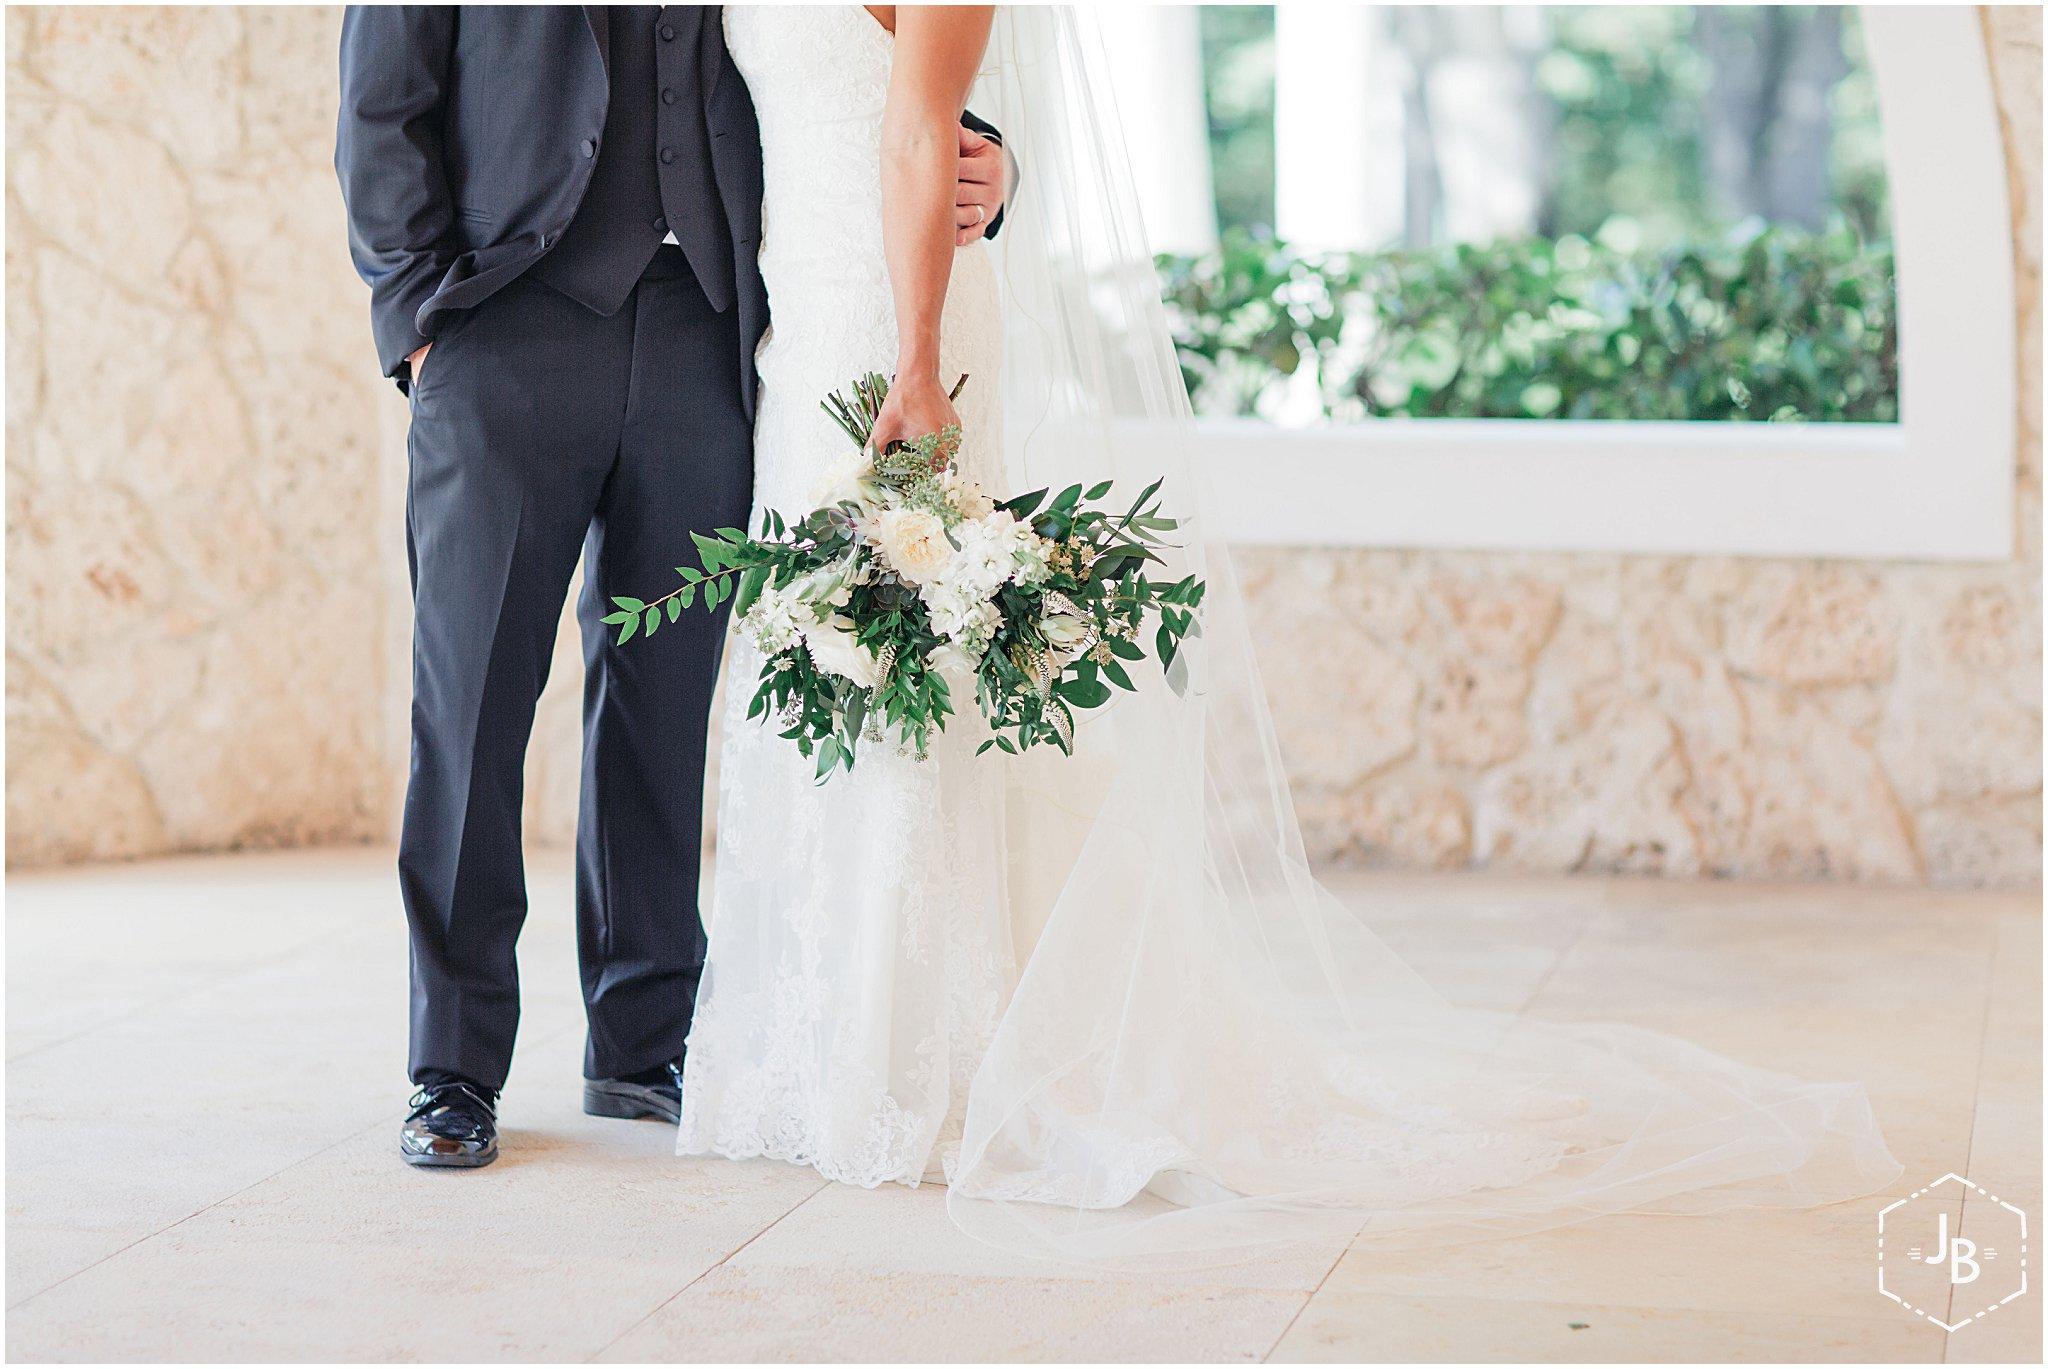 WeddingandEngagementFloridaPhotographer_0223.jpg